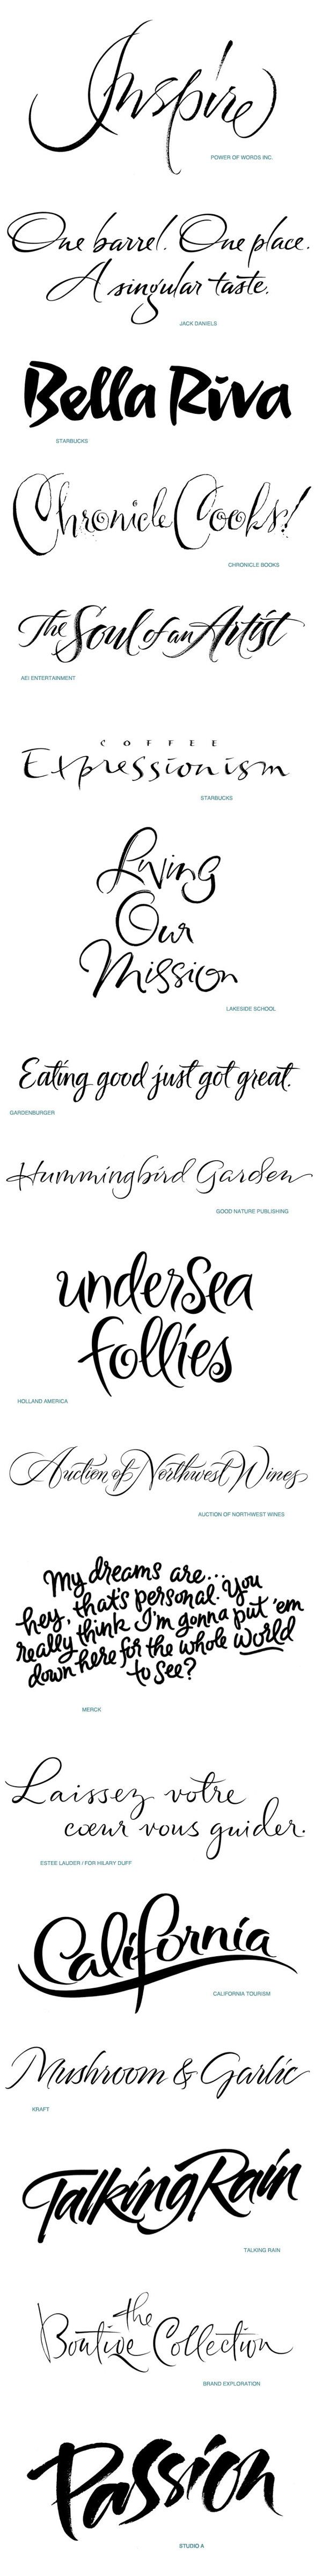 Contemporary Script Lettering Portfolio One by Iskra Johnson, via Behance